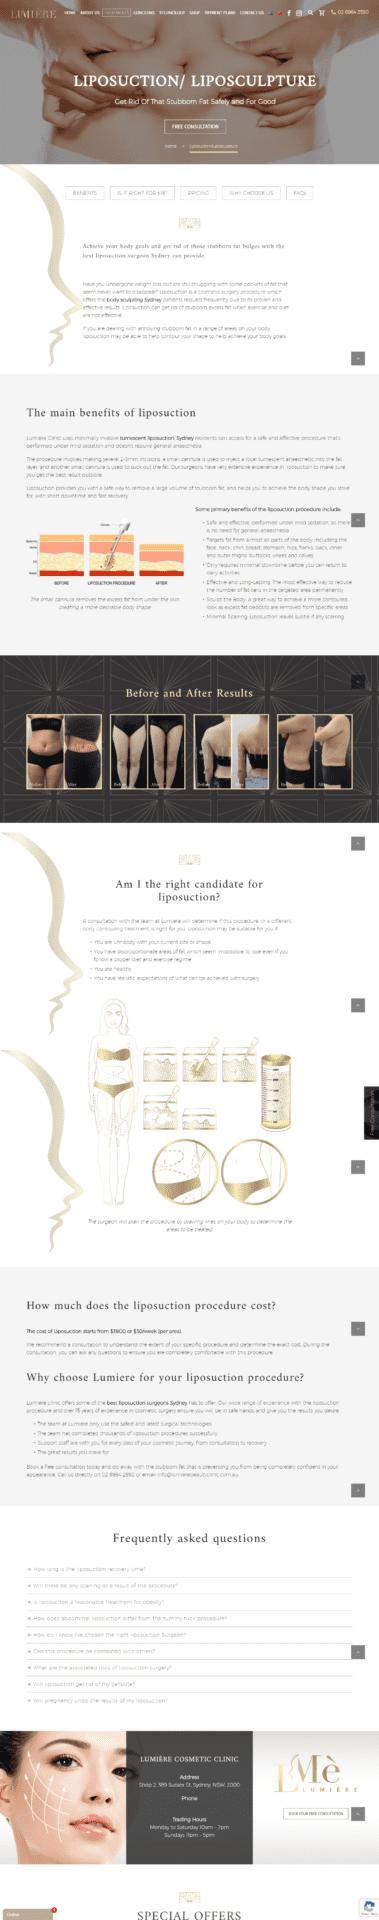 Lumière Beauty Clinic liposuction page